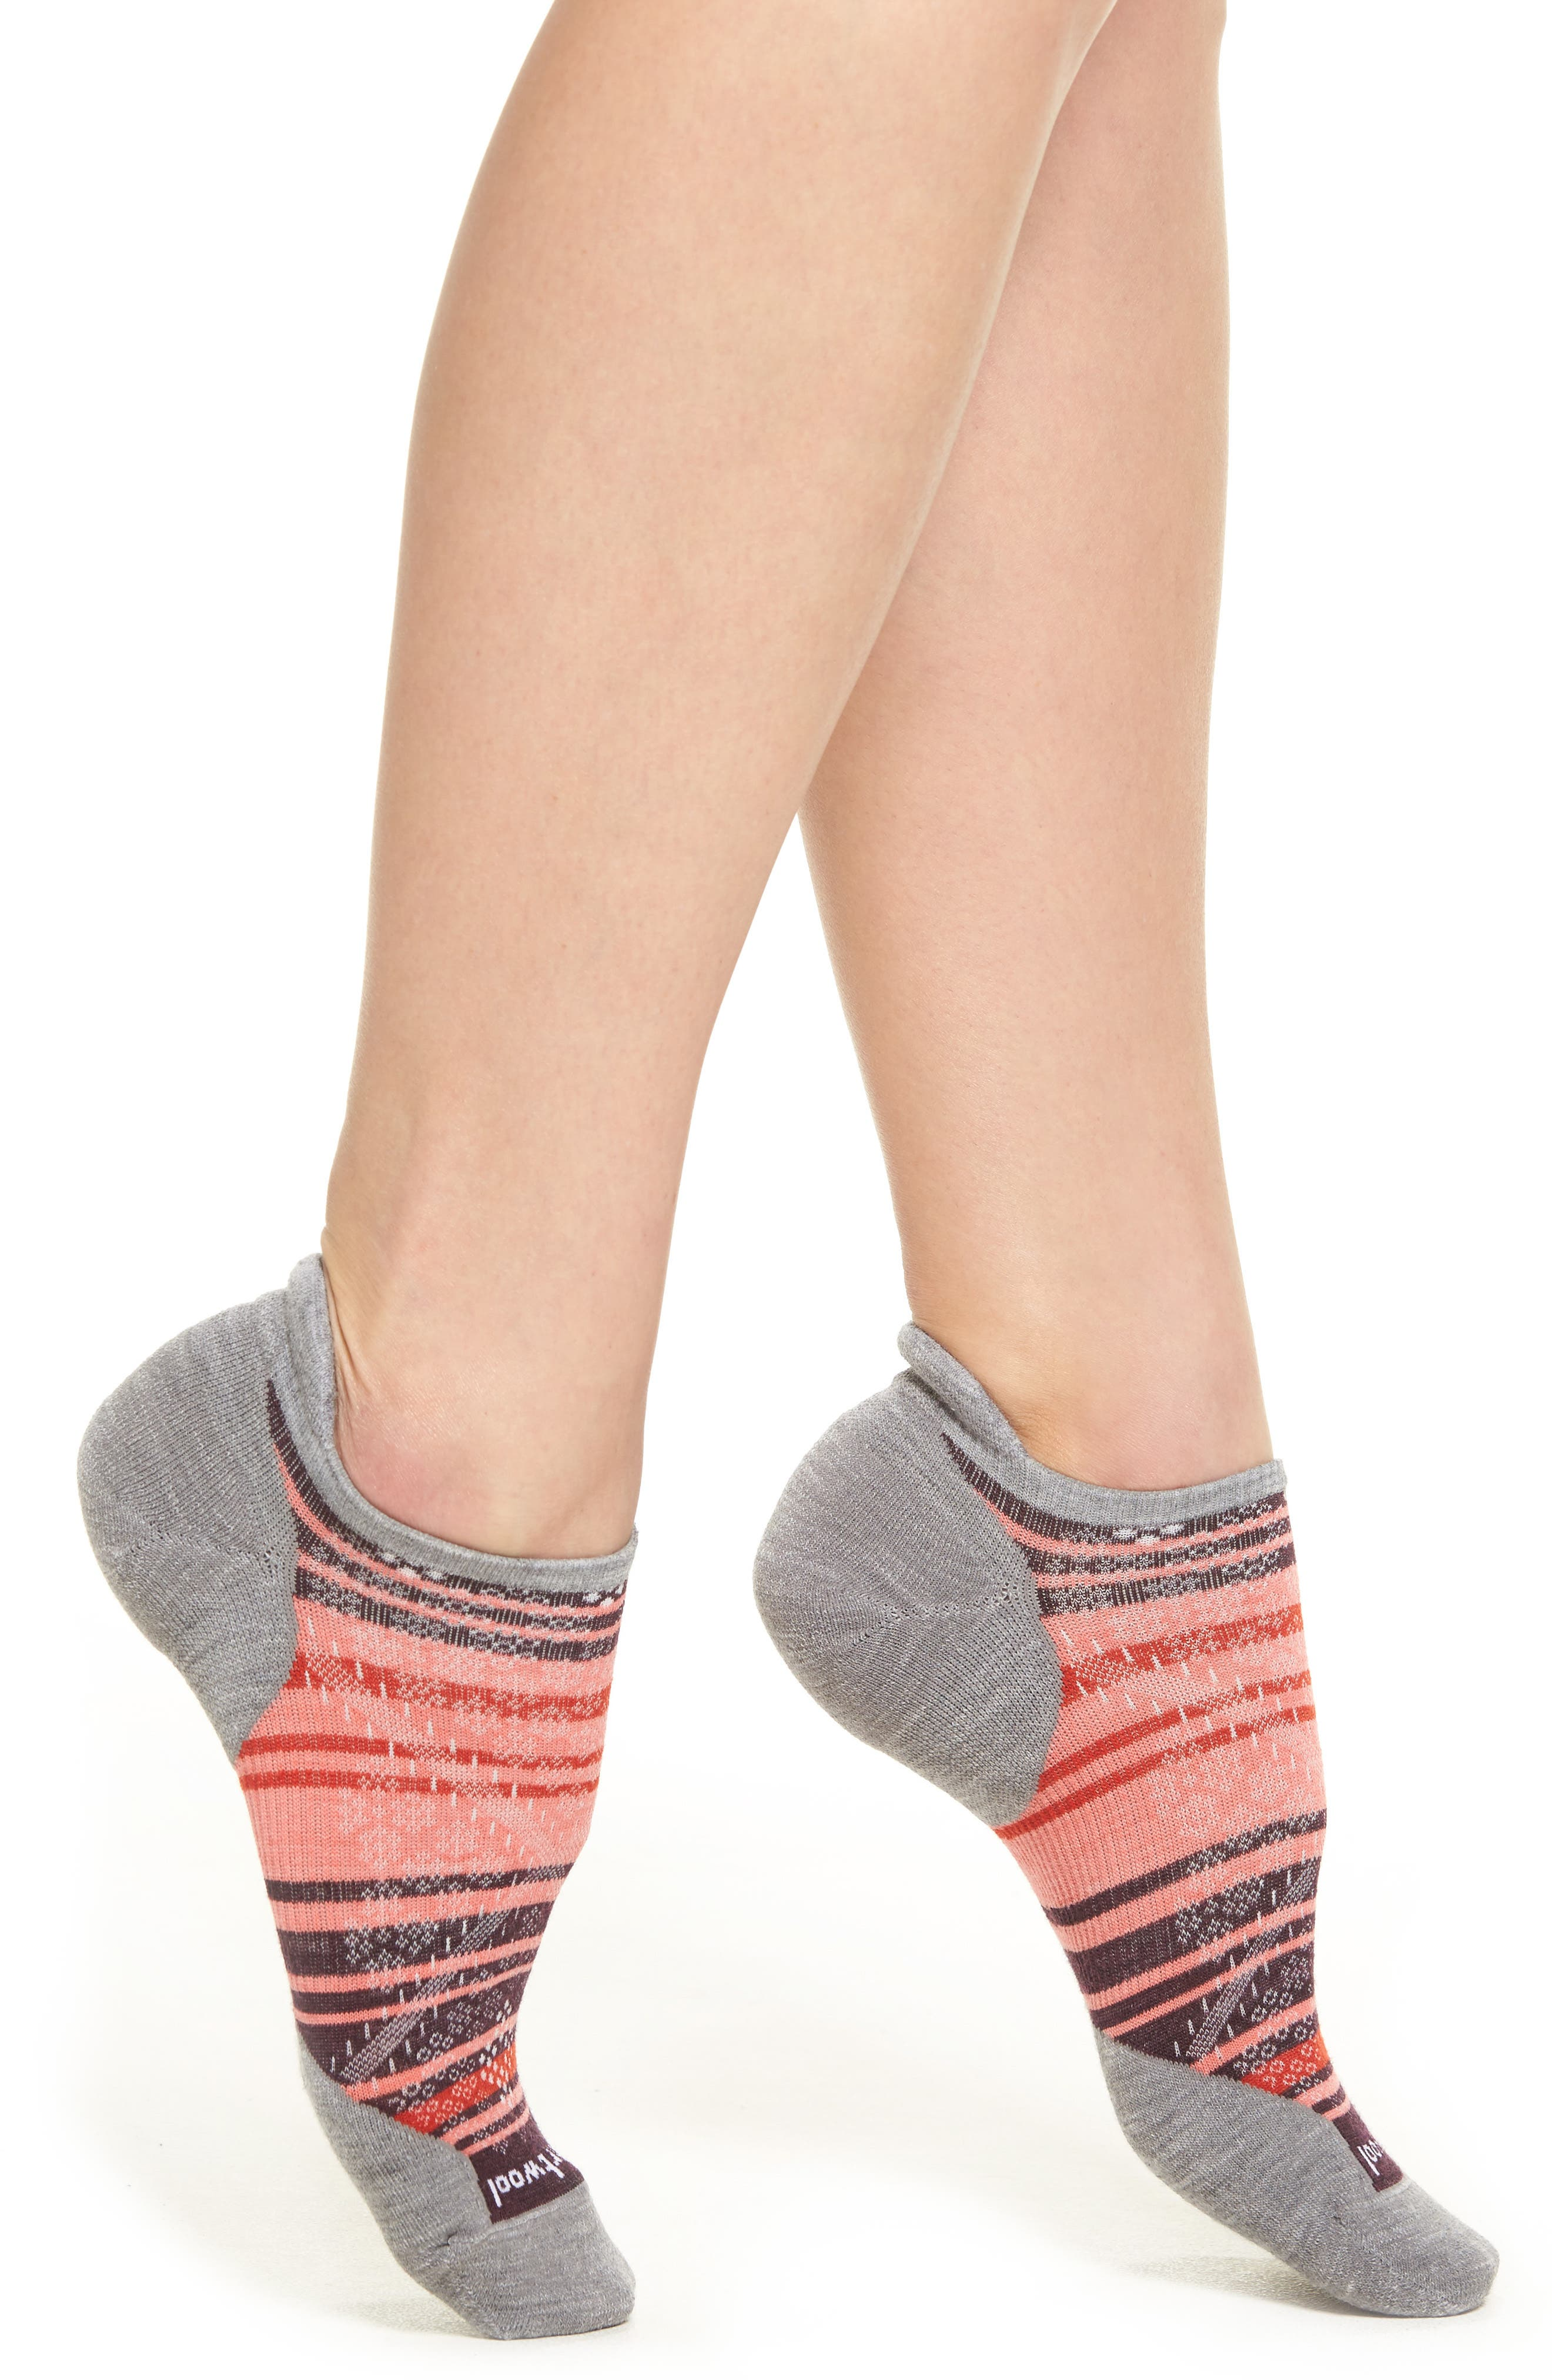 PhD Run Elite Micro No-Show Socks,                             Main thumbnail 1, color,                             Light Gray